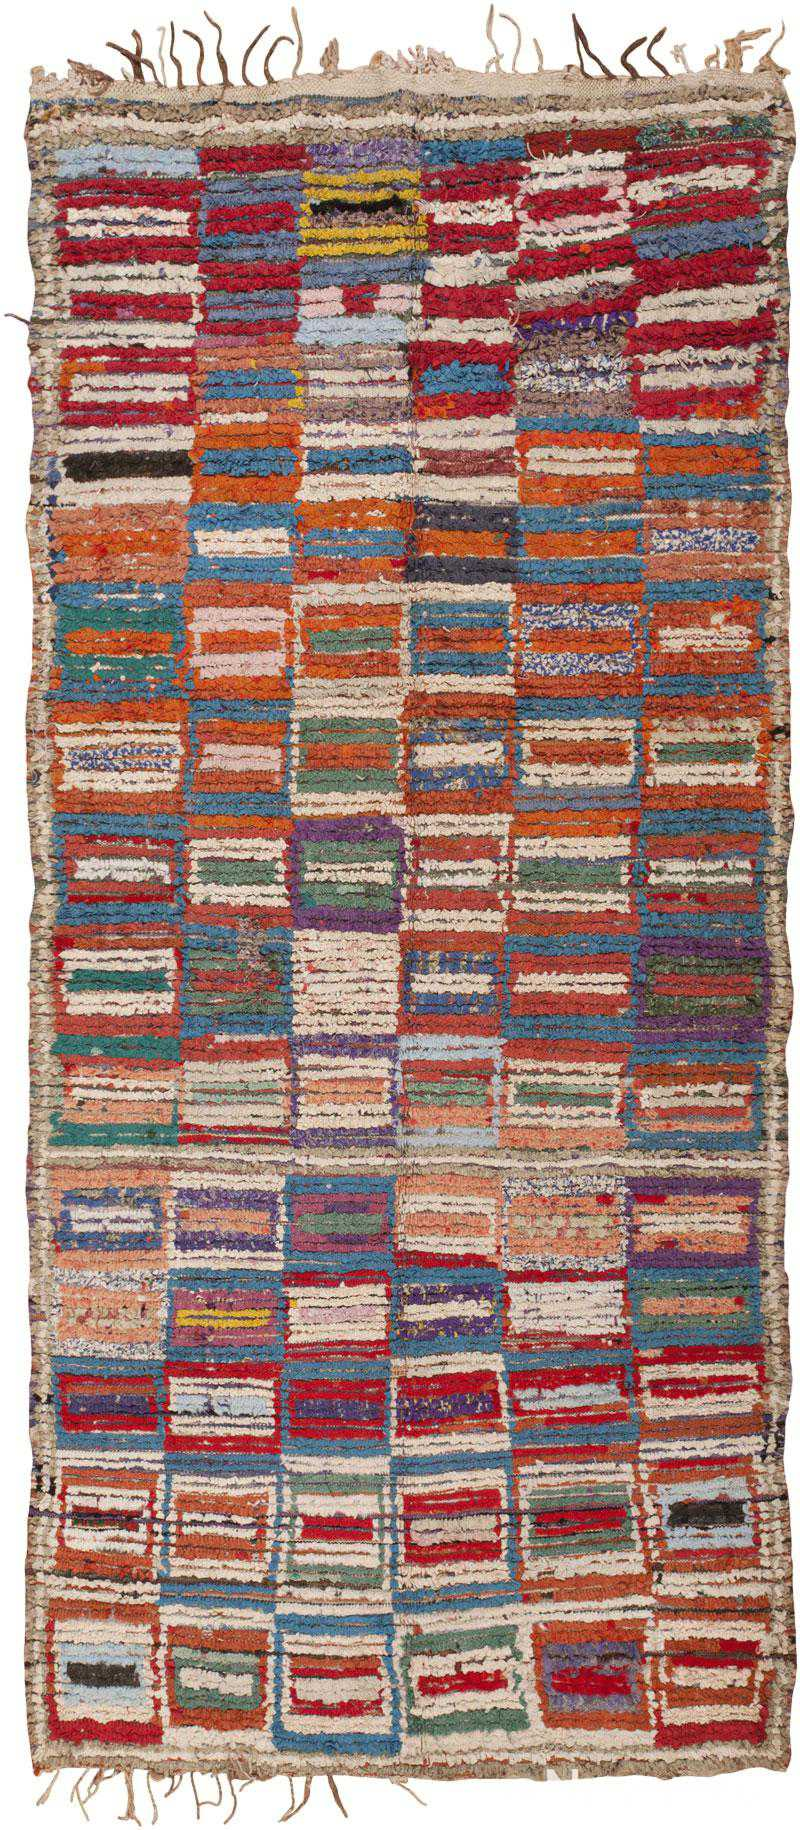 Vintage Moroccan Rug 45728 Detail/Large View